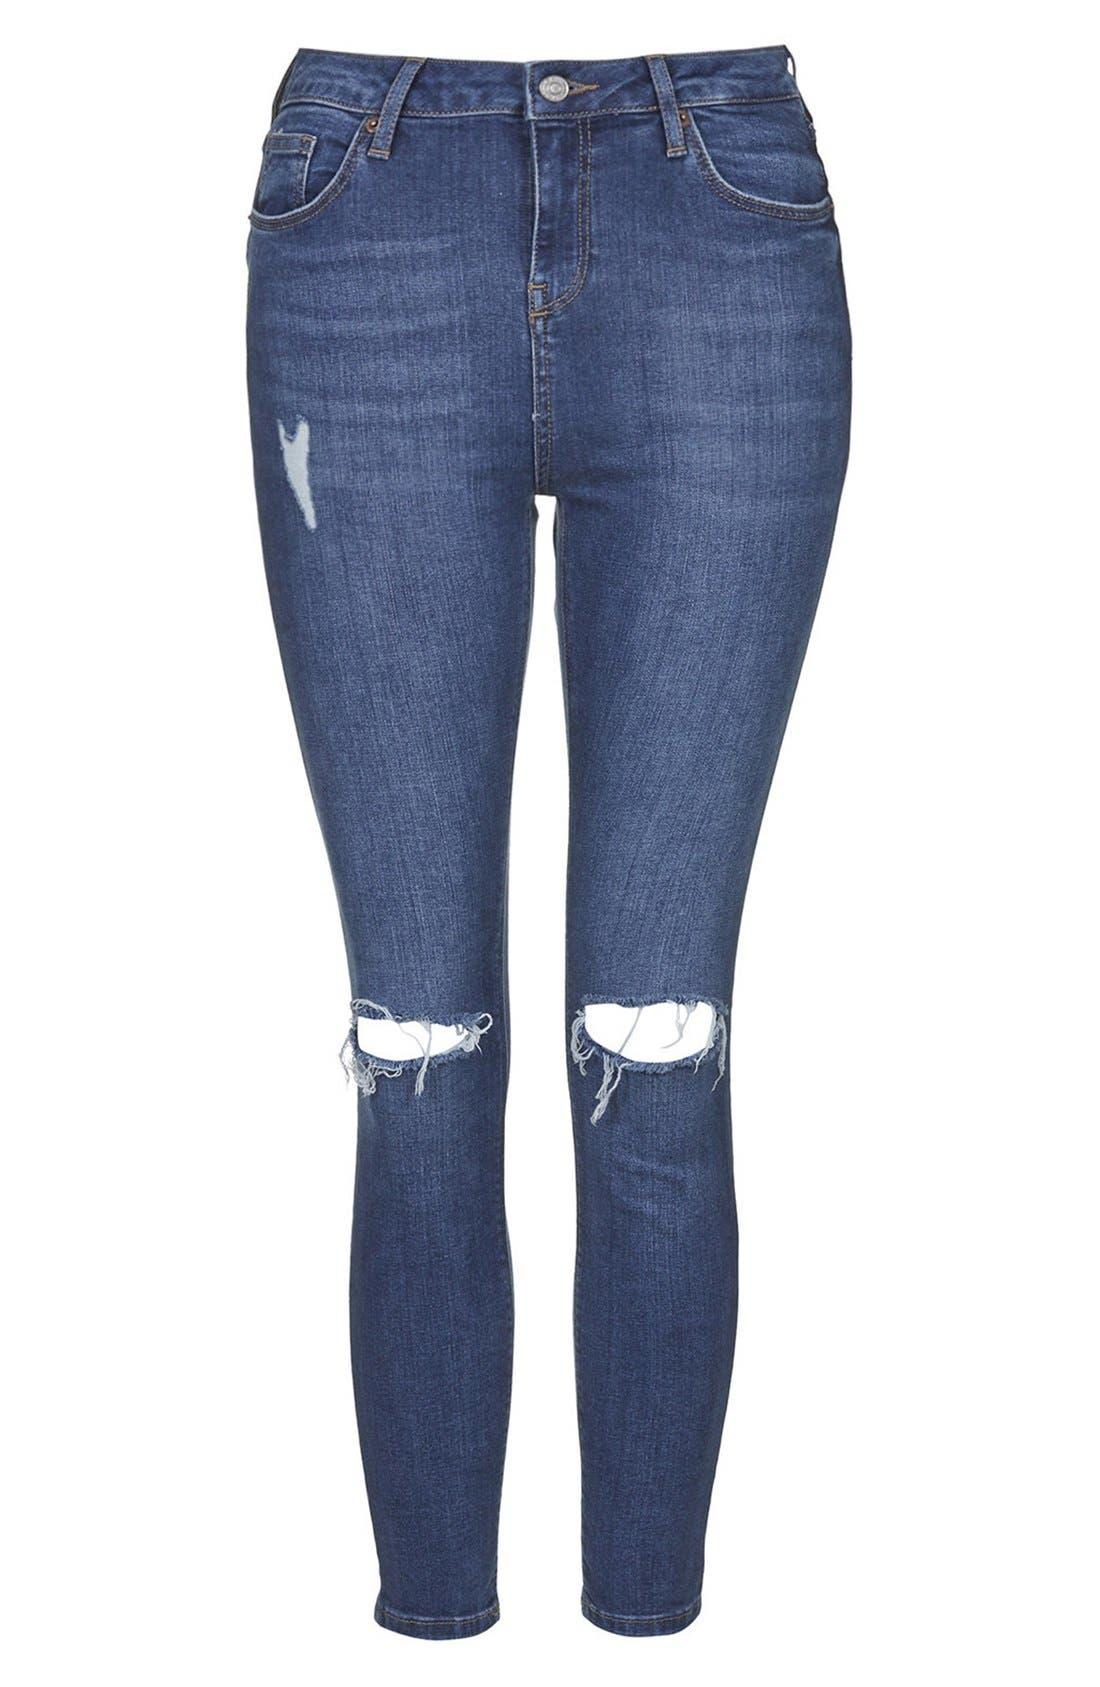 Alternate Image 3  - Topshop Moto 'Jamie' High Rise Skinny Jeans (Petite)